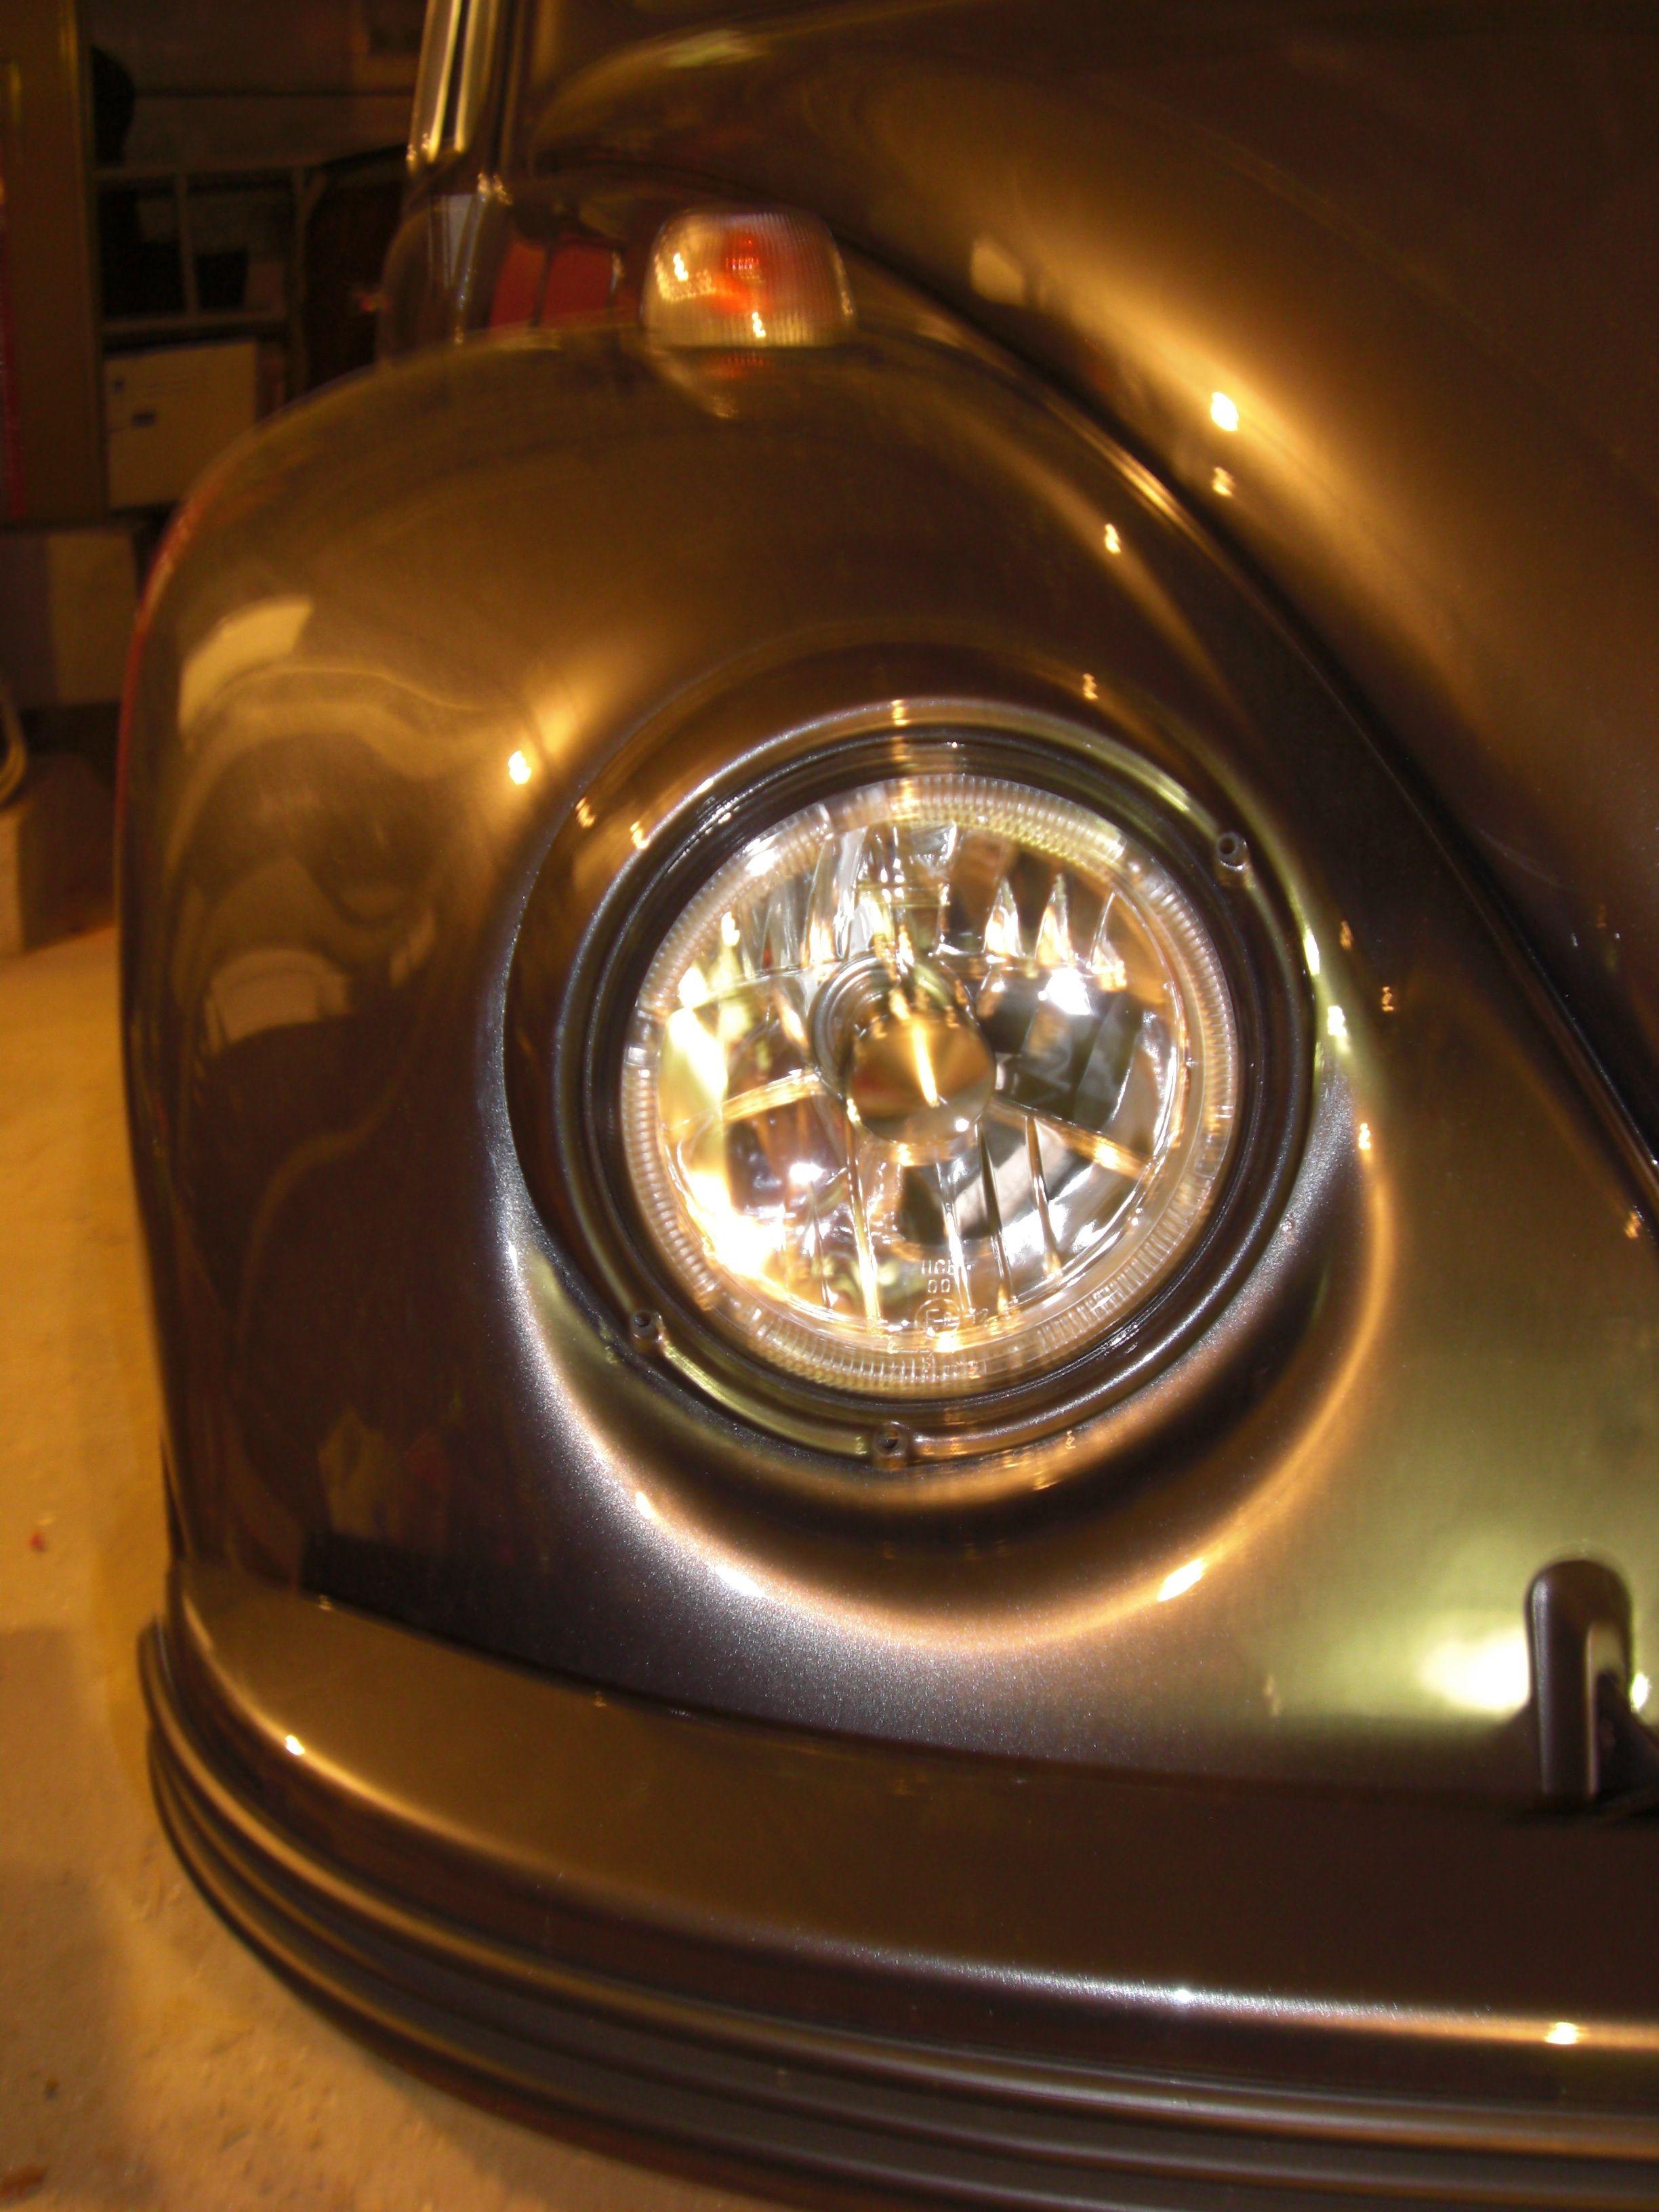 phare angel eyes adaptable sur vw1302 de 72? 781290CIMG8896